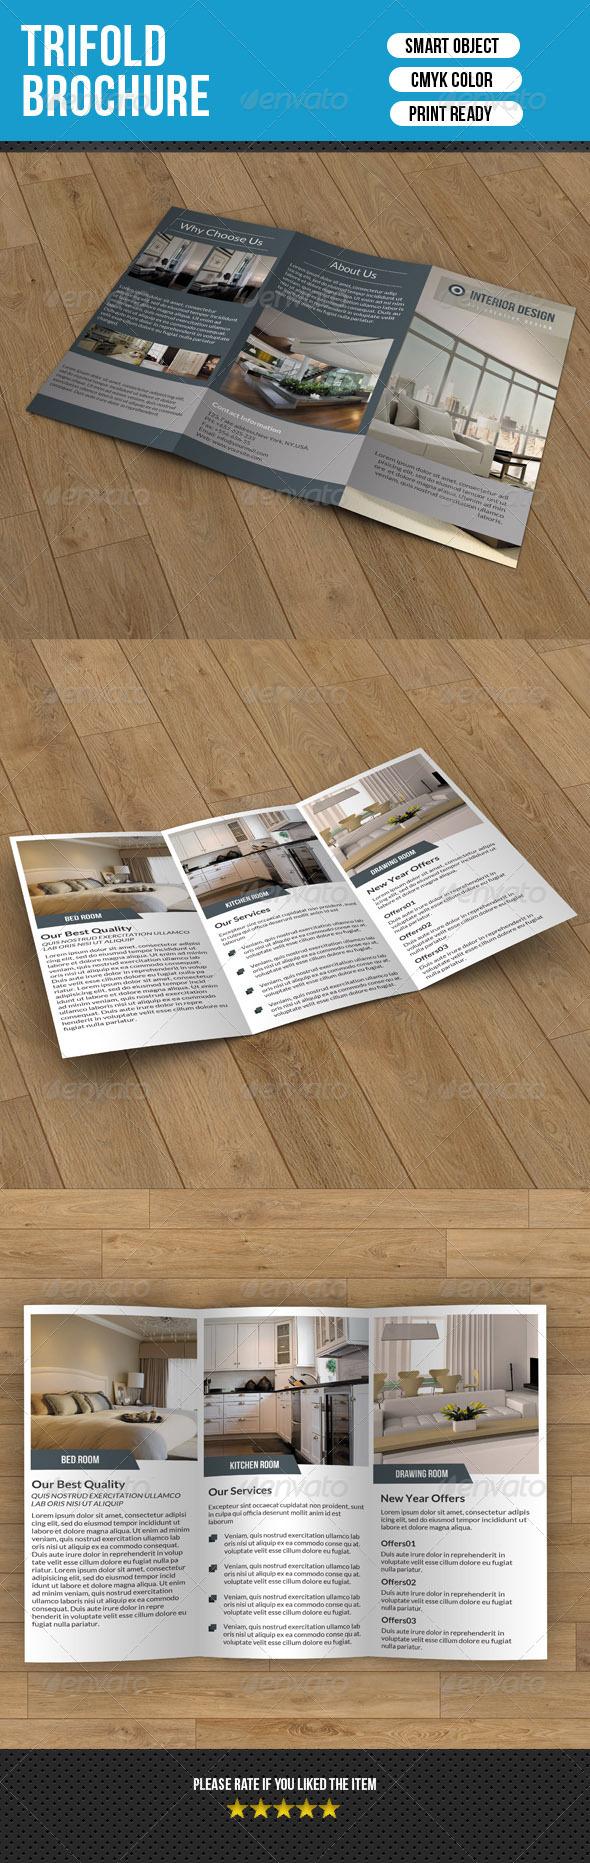 Minimal Trifold-Interior Design V3 - Corporate Brochures